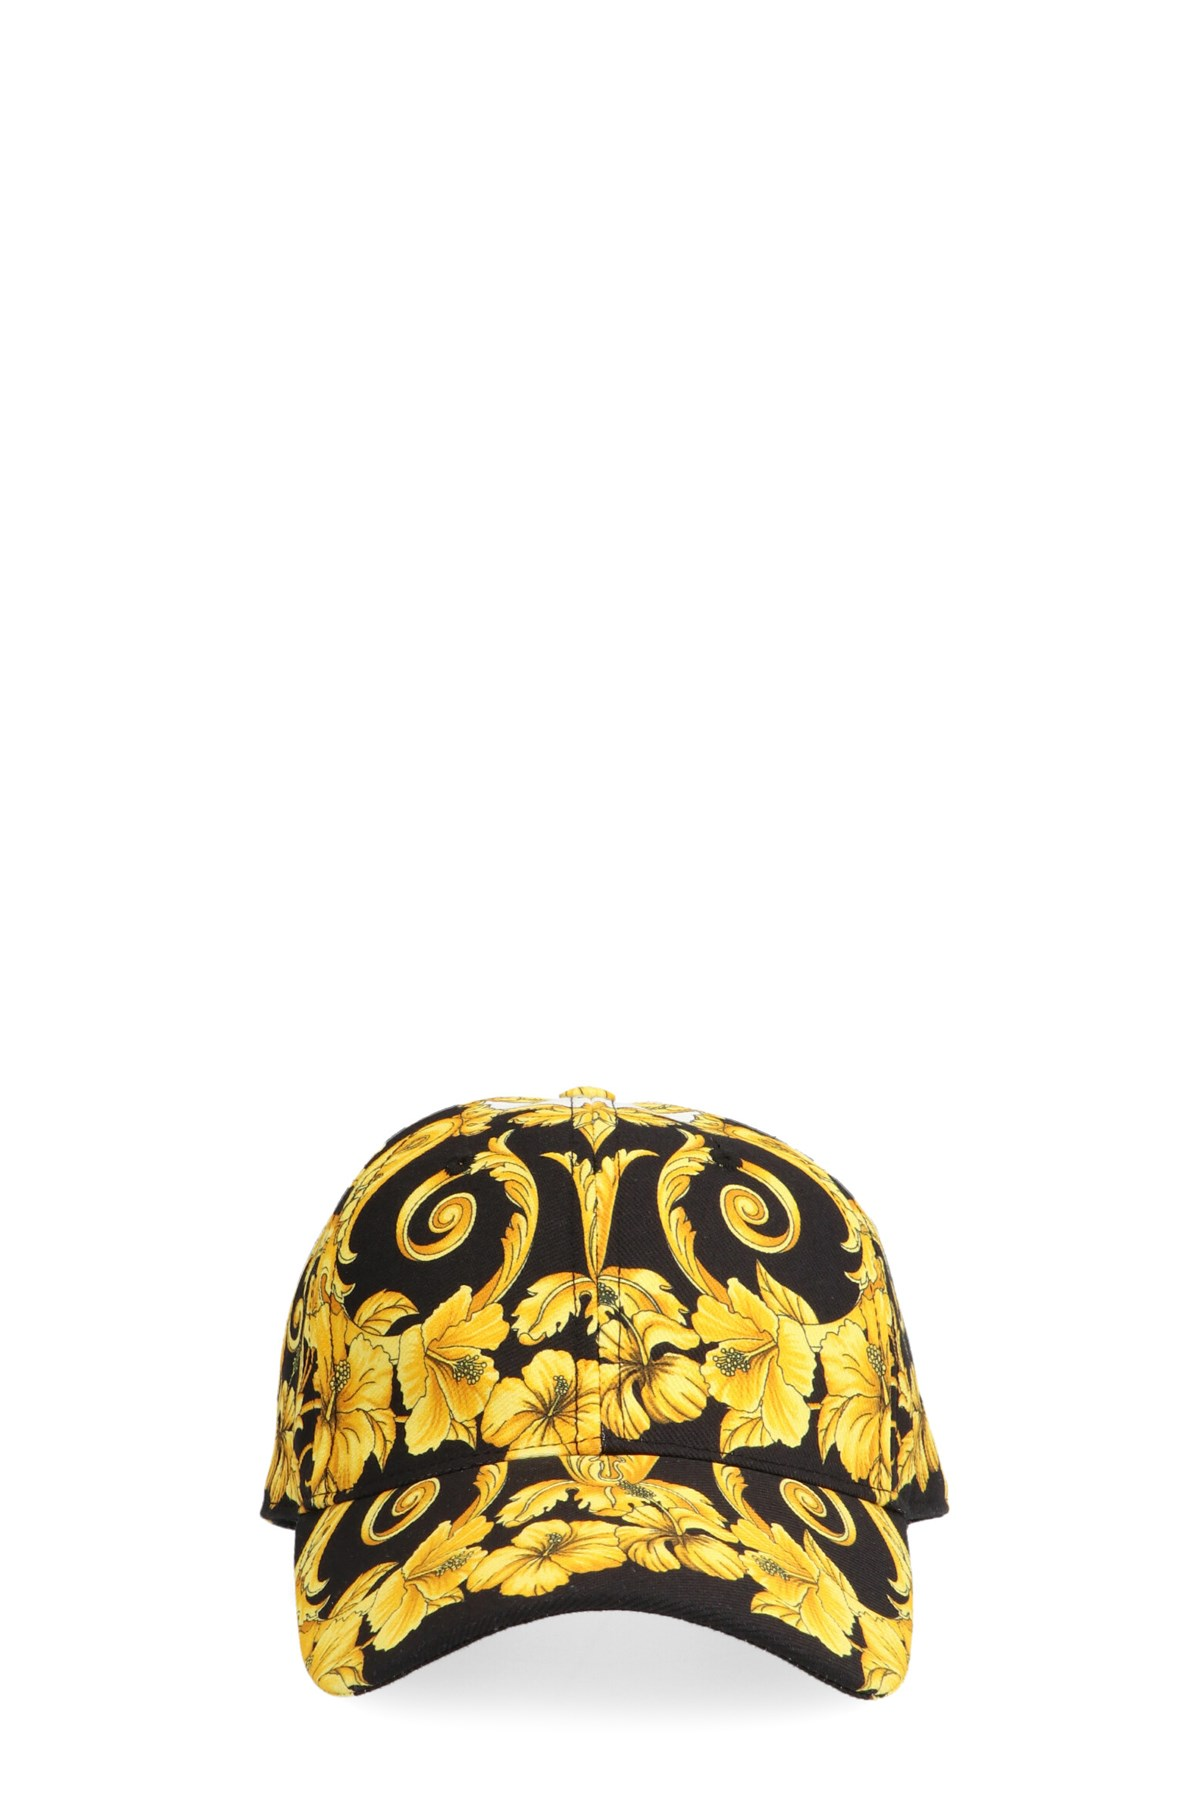 5740f155ccb1e versace  Barocco gold ibiscus  cap available on julian-fashion.com ...